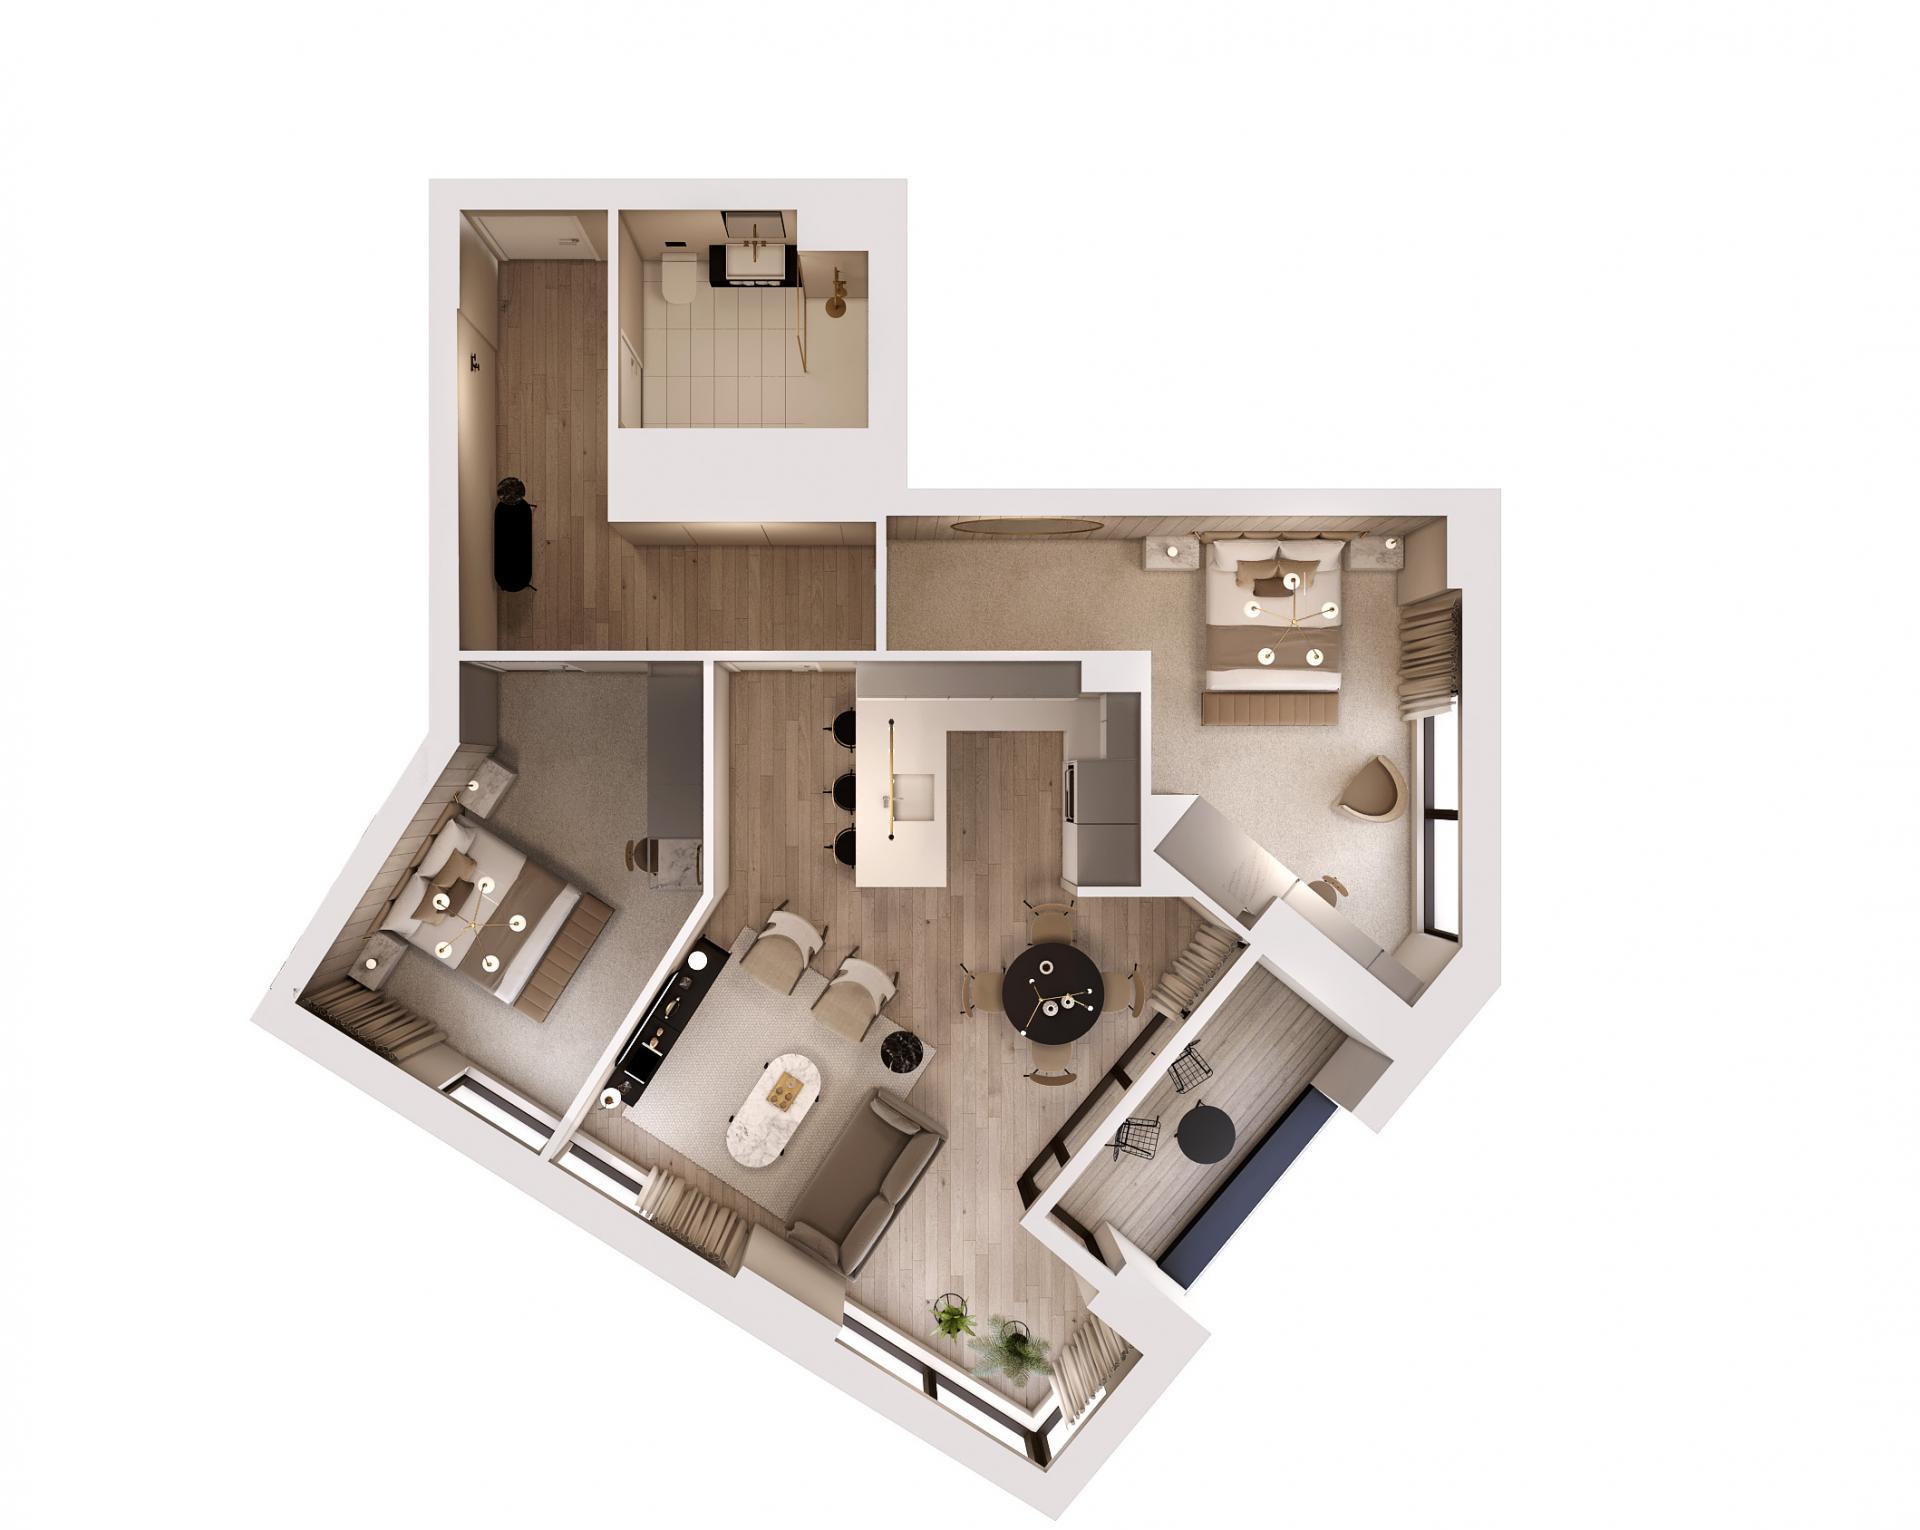 2 bed 2 bath floor plan at STAY Camden Serviced Apartments, Camden, London